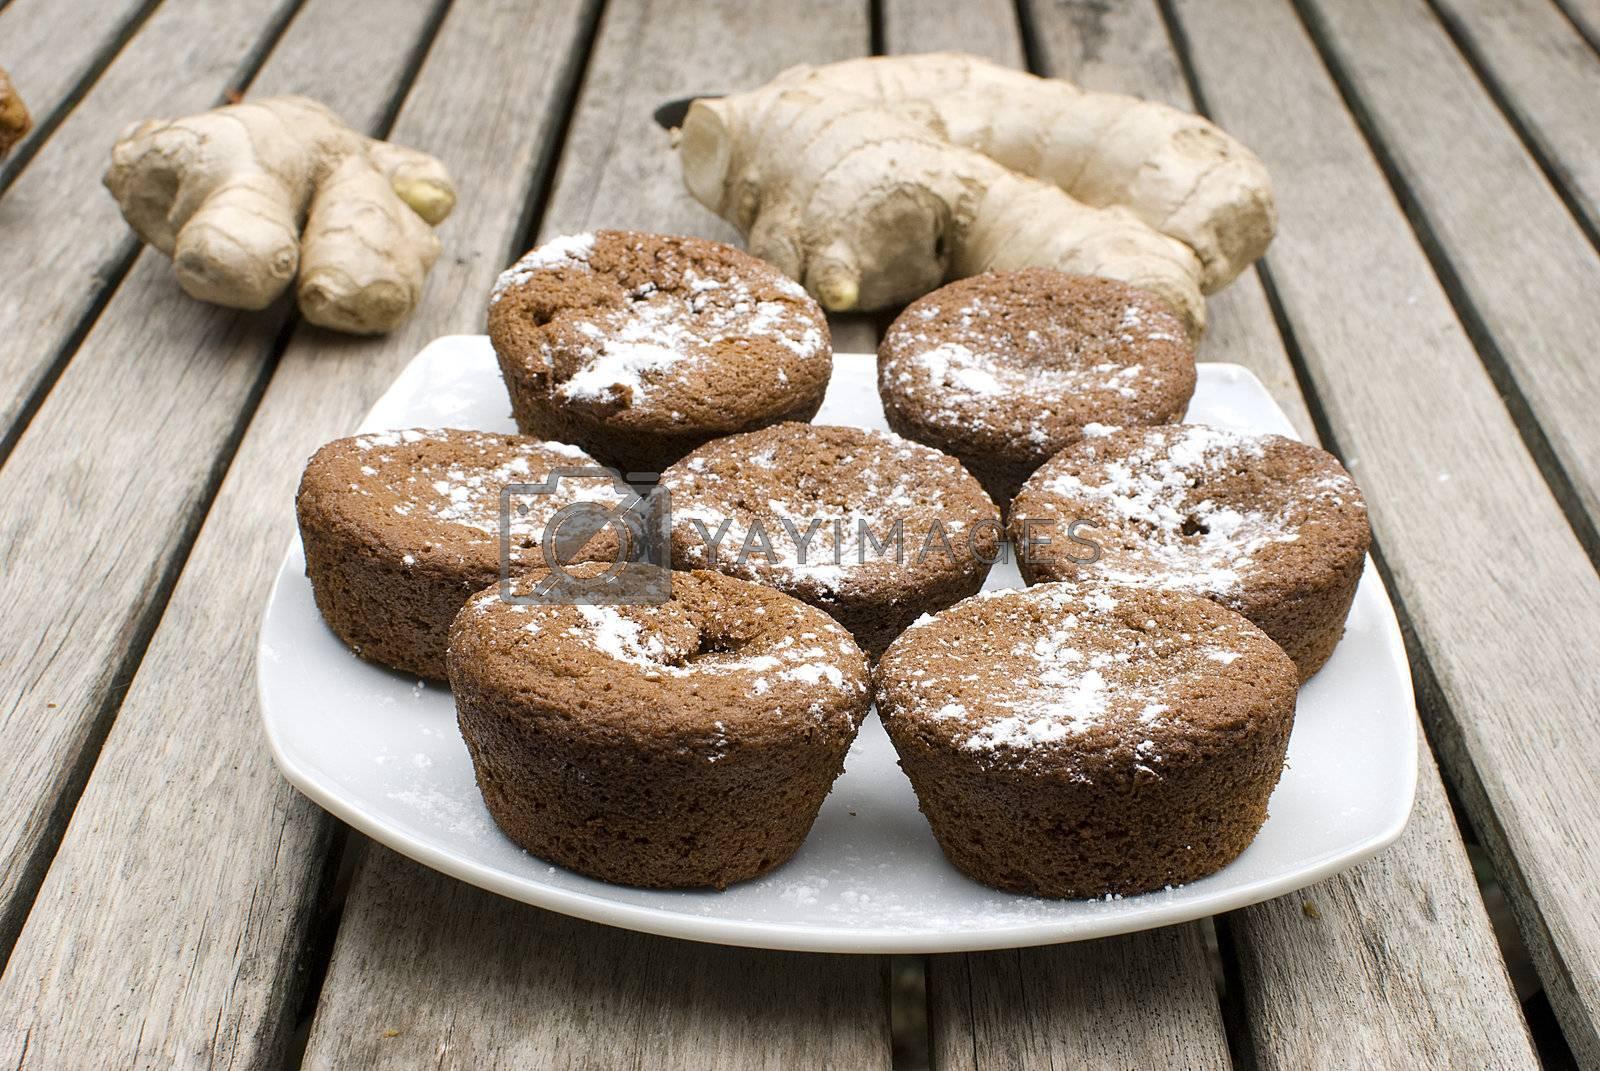 ginger cookies by Dessie_bg